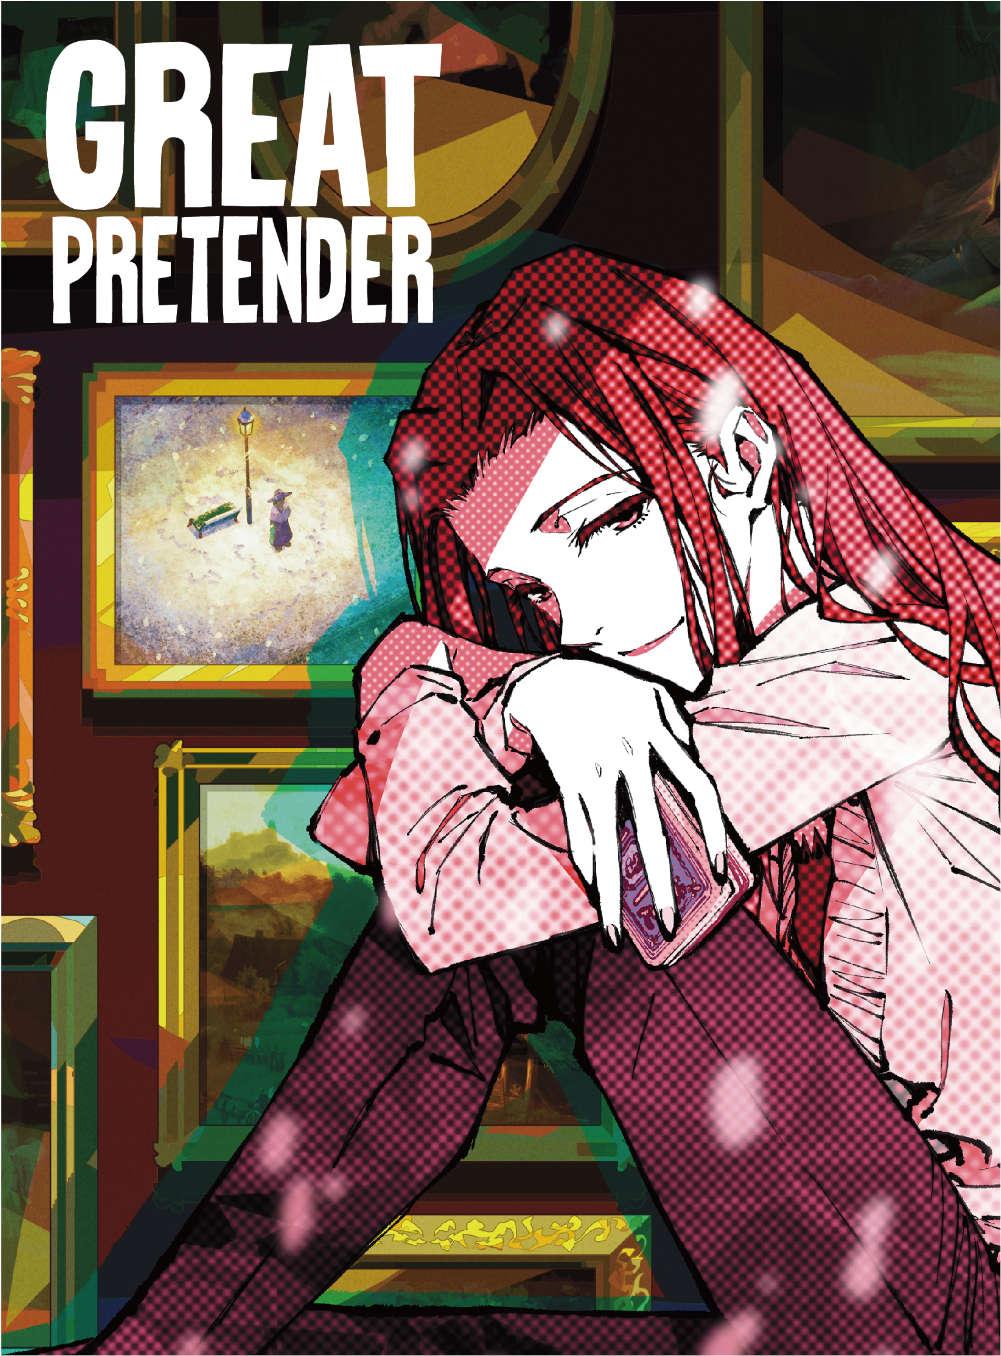 「GREAT PRETENDER」CASE 3 スノー・オブ・ロンドン Blu-ray